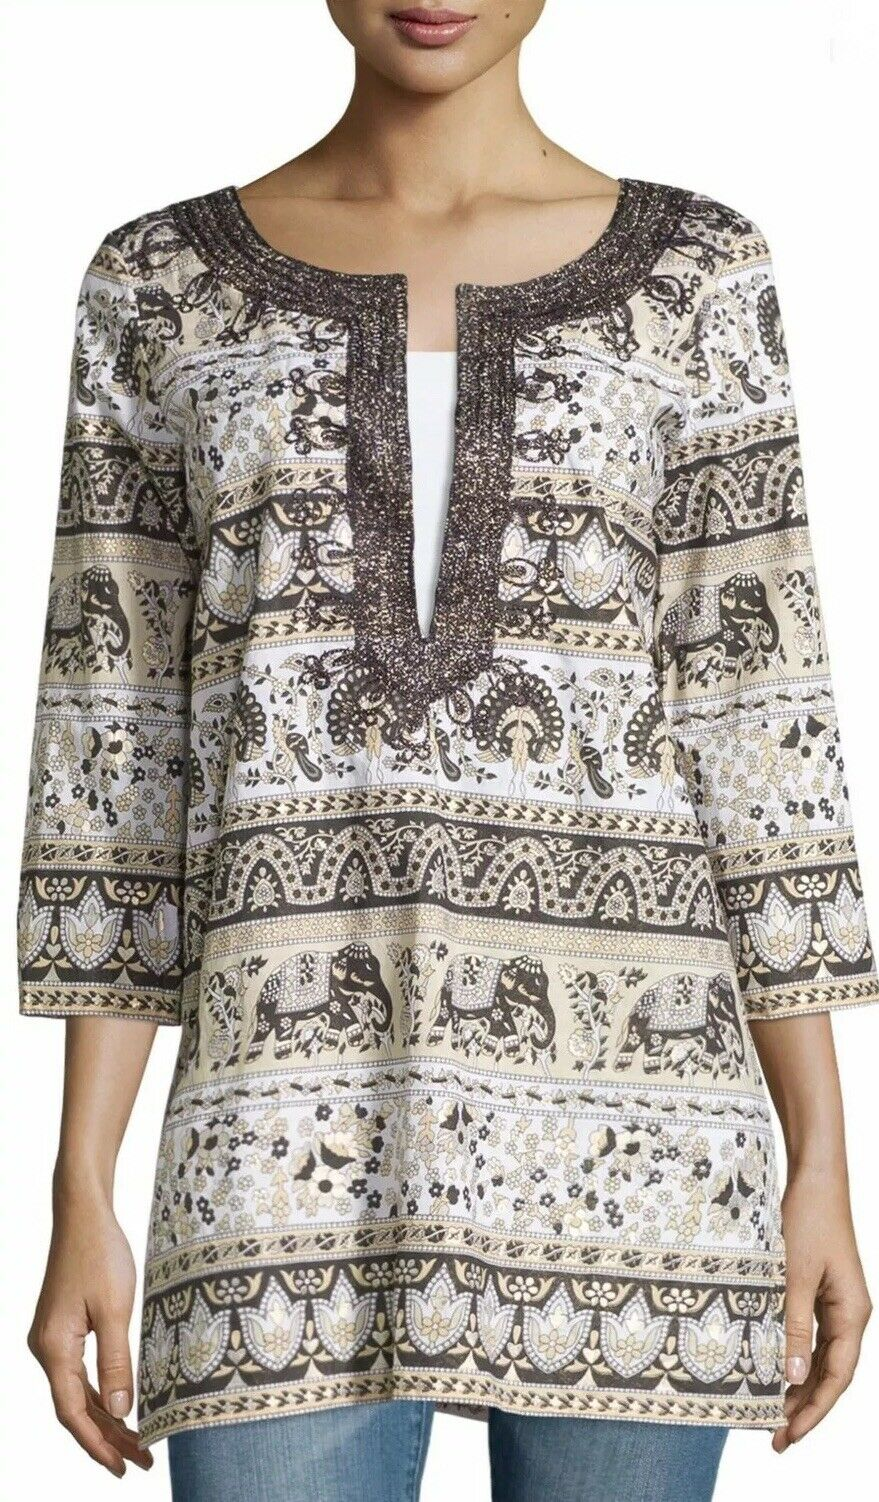 Calypso St Barth Olipant Printed Cotton Tunic Elephant Embroiderot M